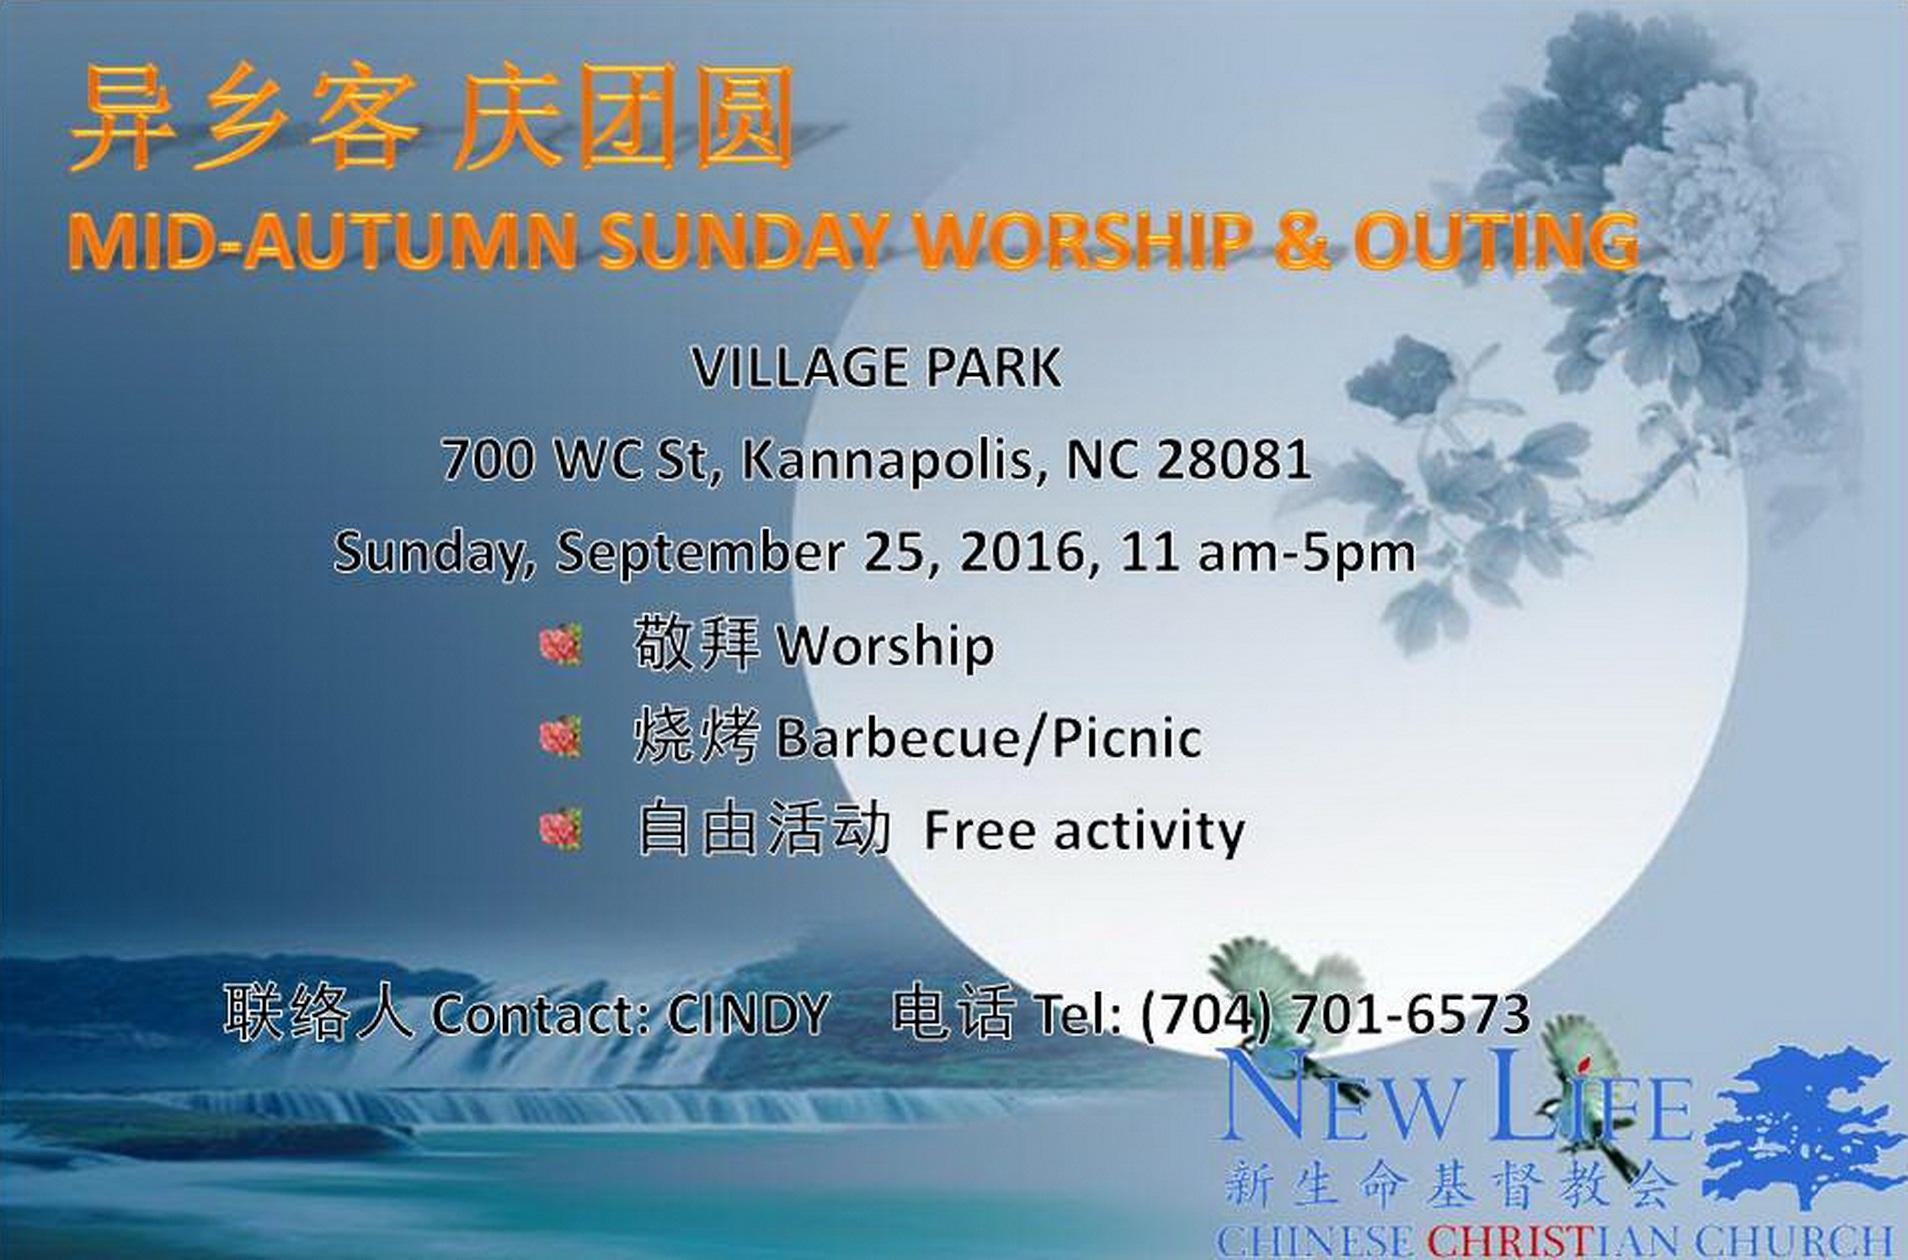 MID-AUTUMN SUNDAY WORSHIP & OUTING